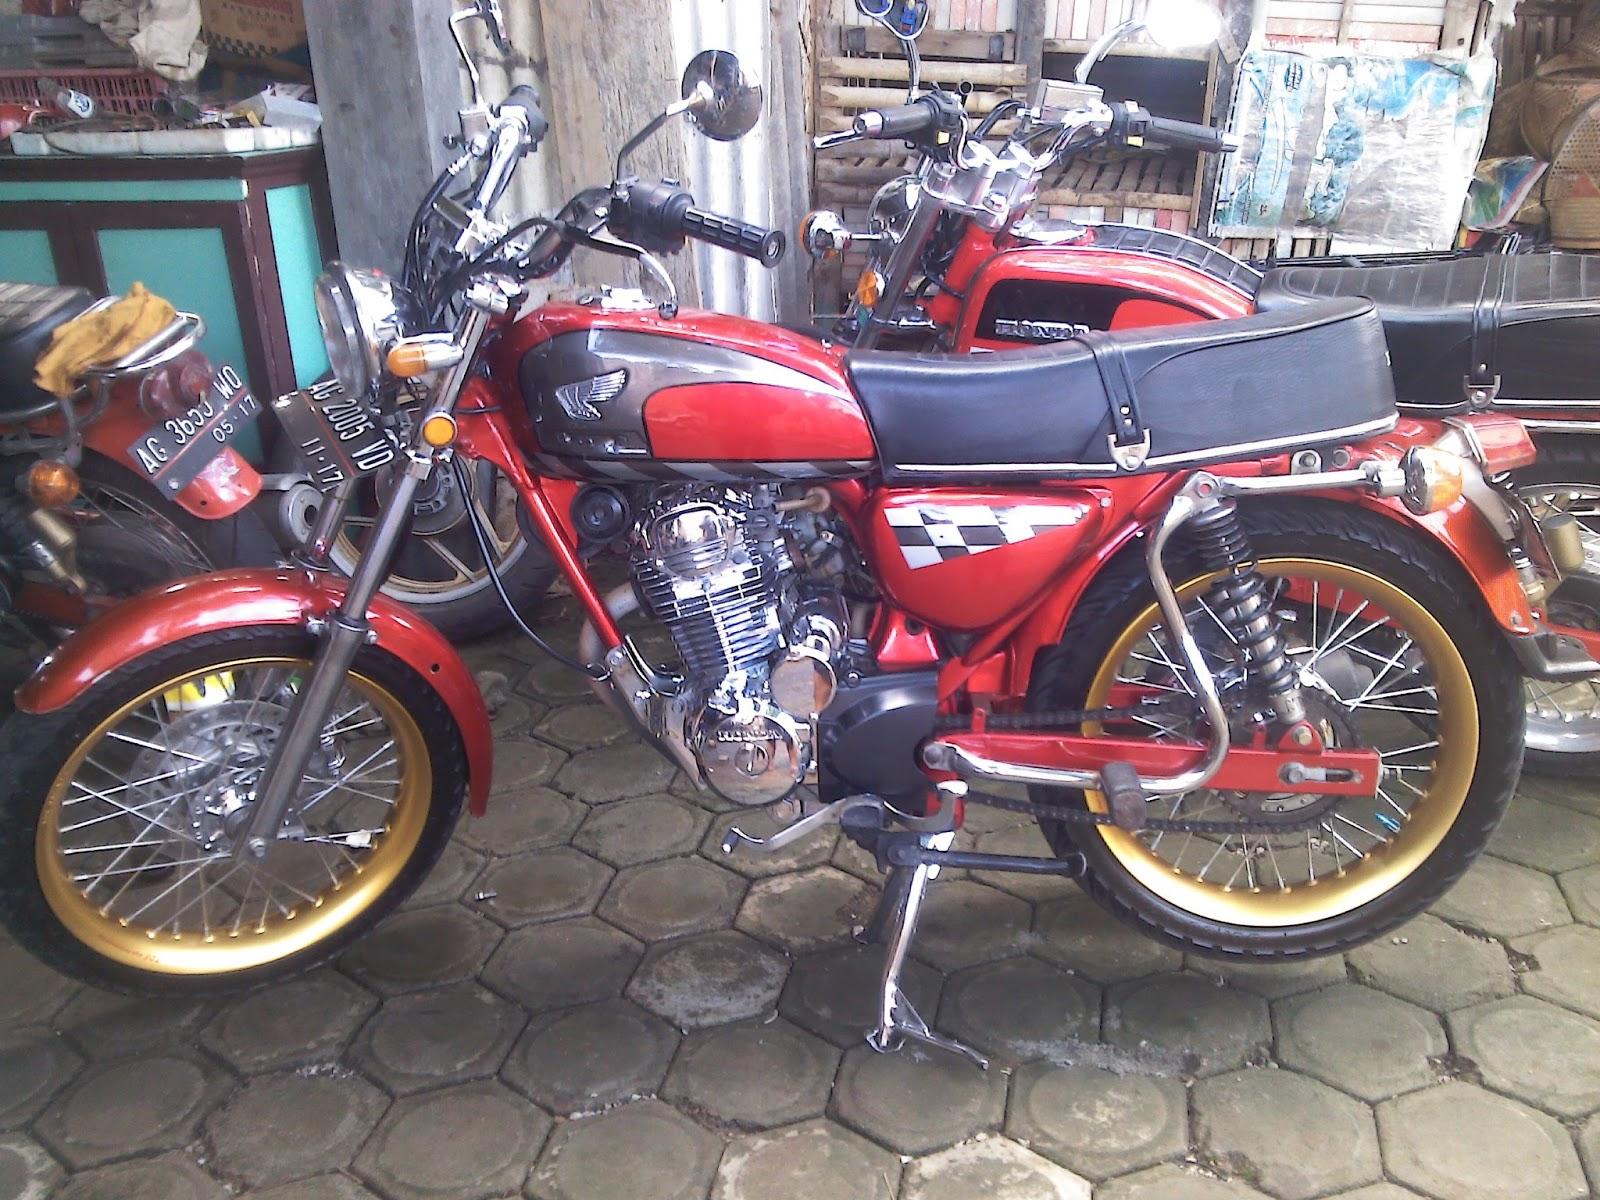 Koleksi Modifikasi Motor Lampung Terlengkap Pojok Otomania